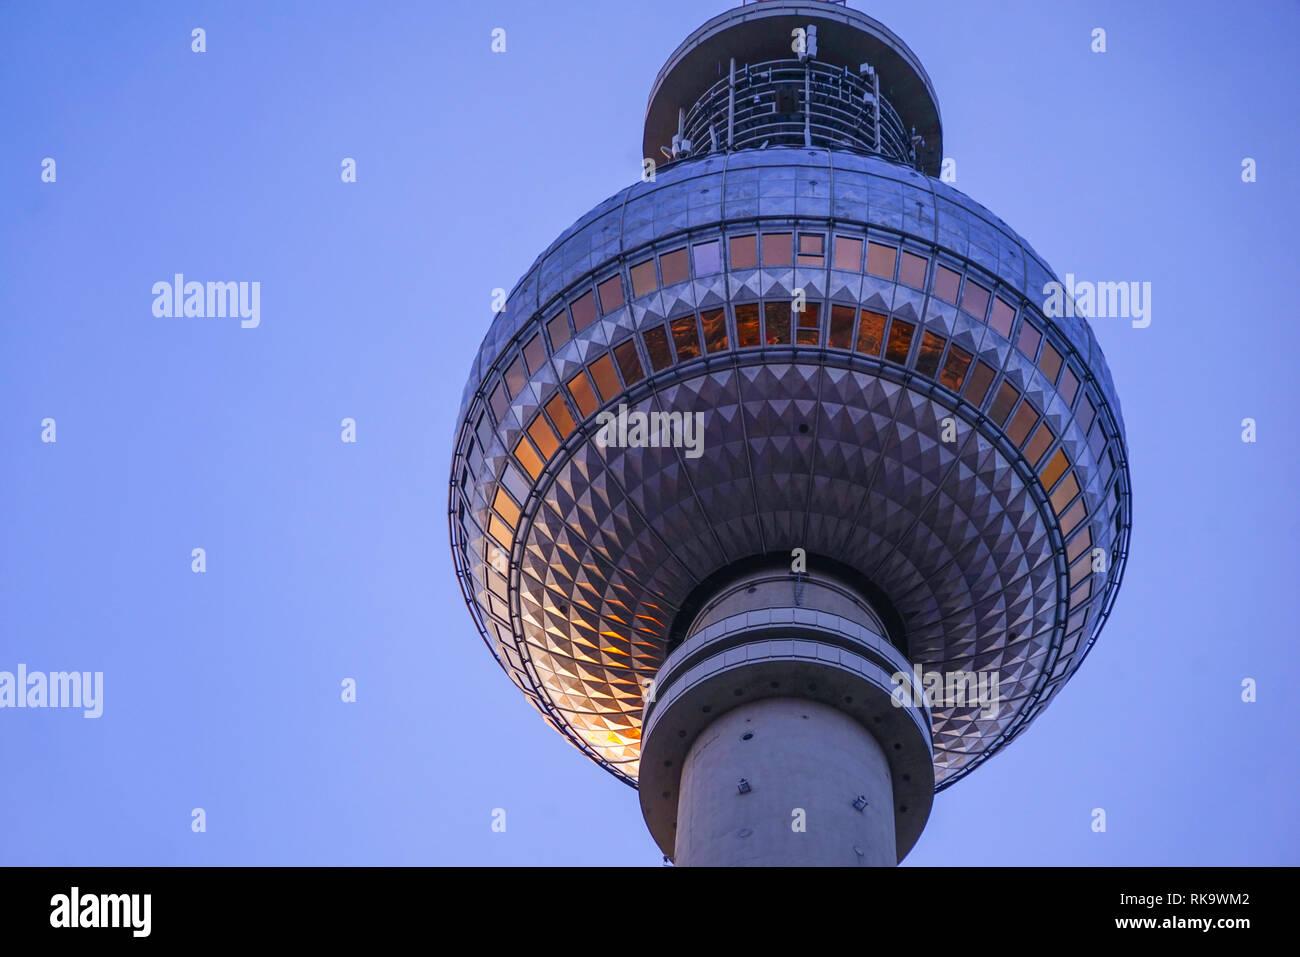 Berlin Alexanderplatz Fernsehturm - Stock Image